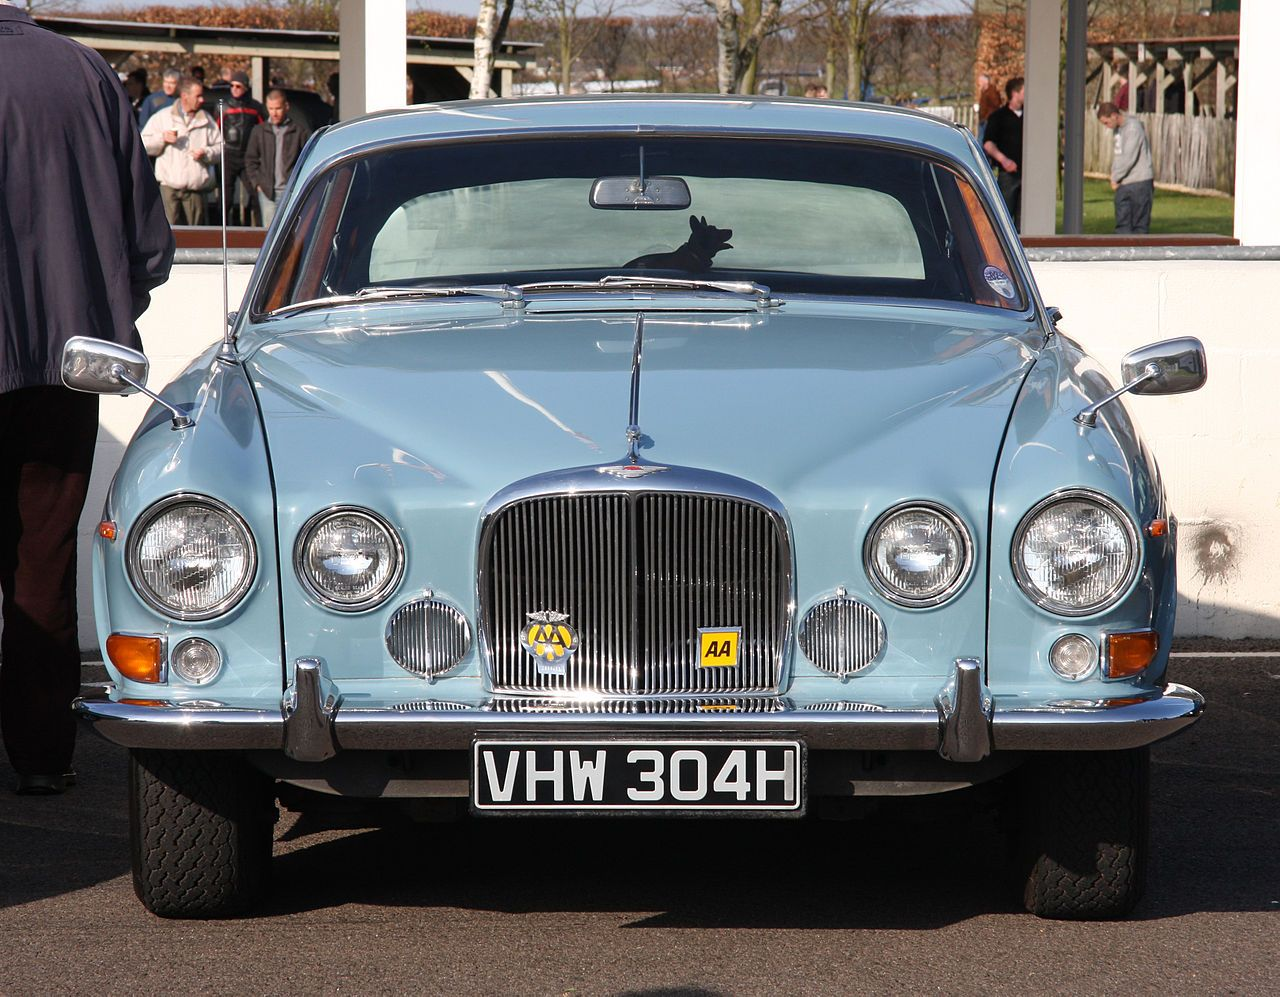 Jaguar 420G 1970 - front view. | Car front, Ferrari 458 ...